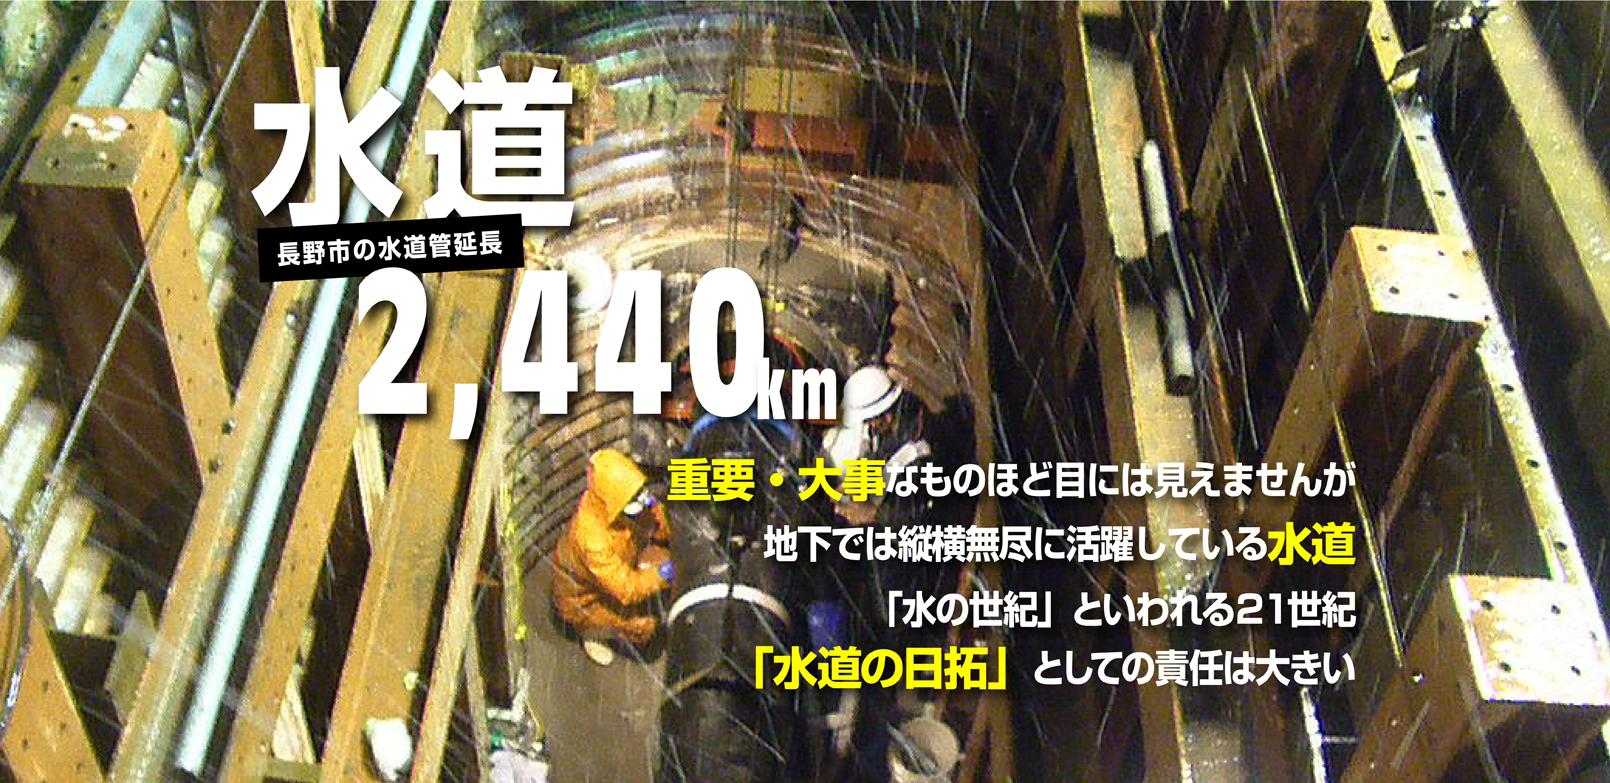 長野市の水道管延長、水道の日拓